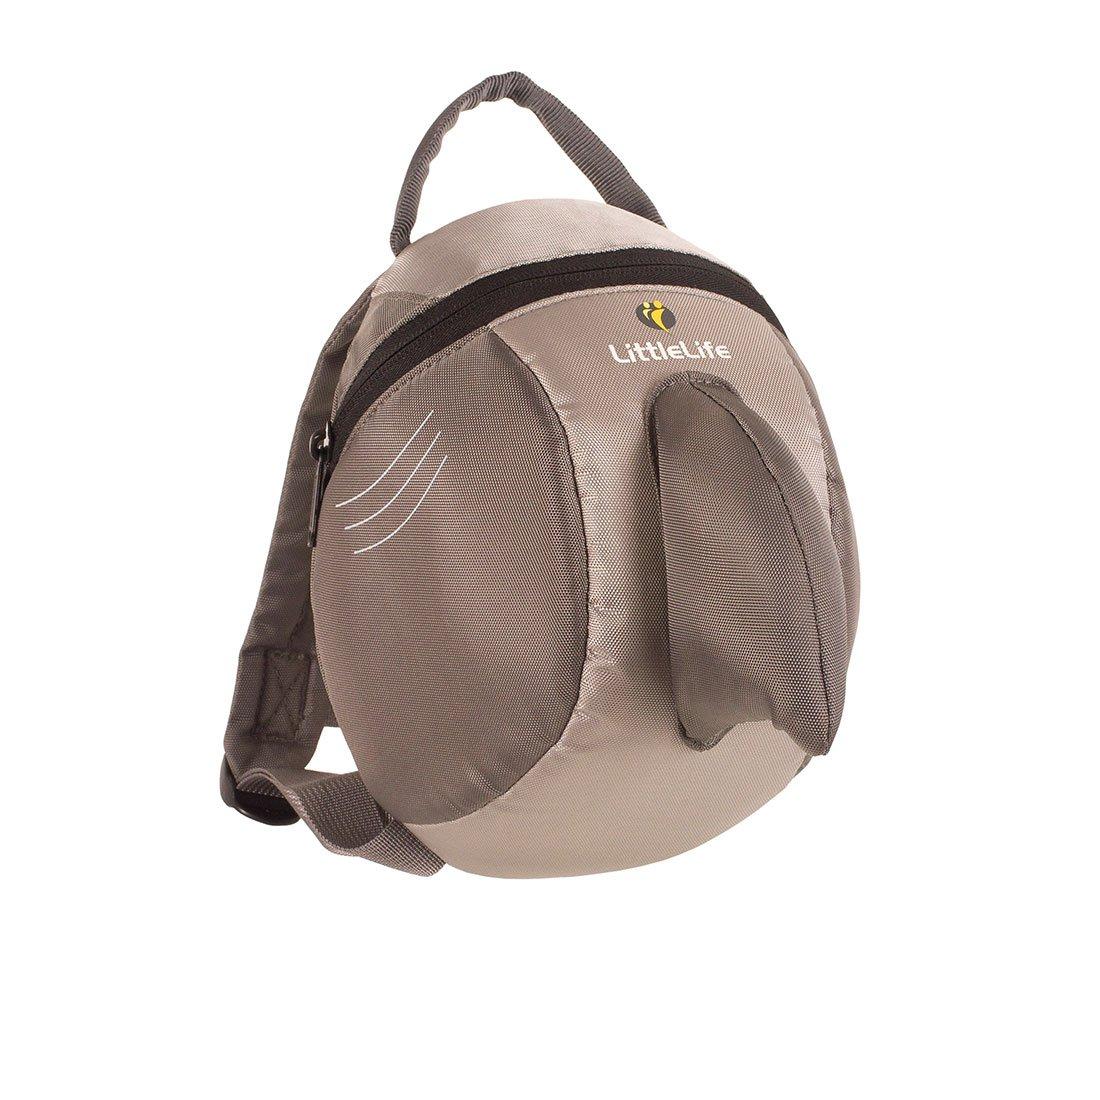 Shark Backpack with Rein   Toddler Backpacks   LittleLife